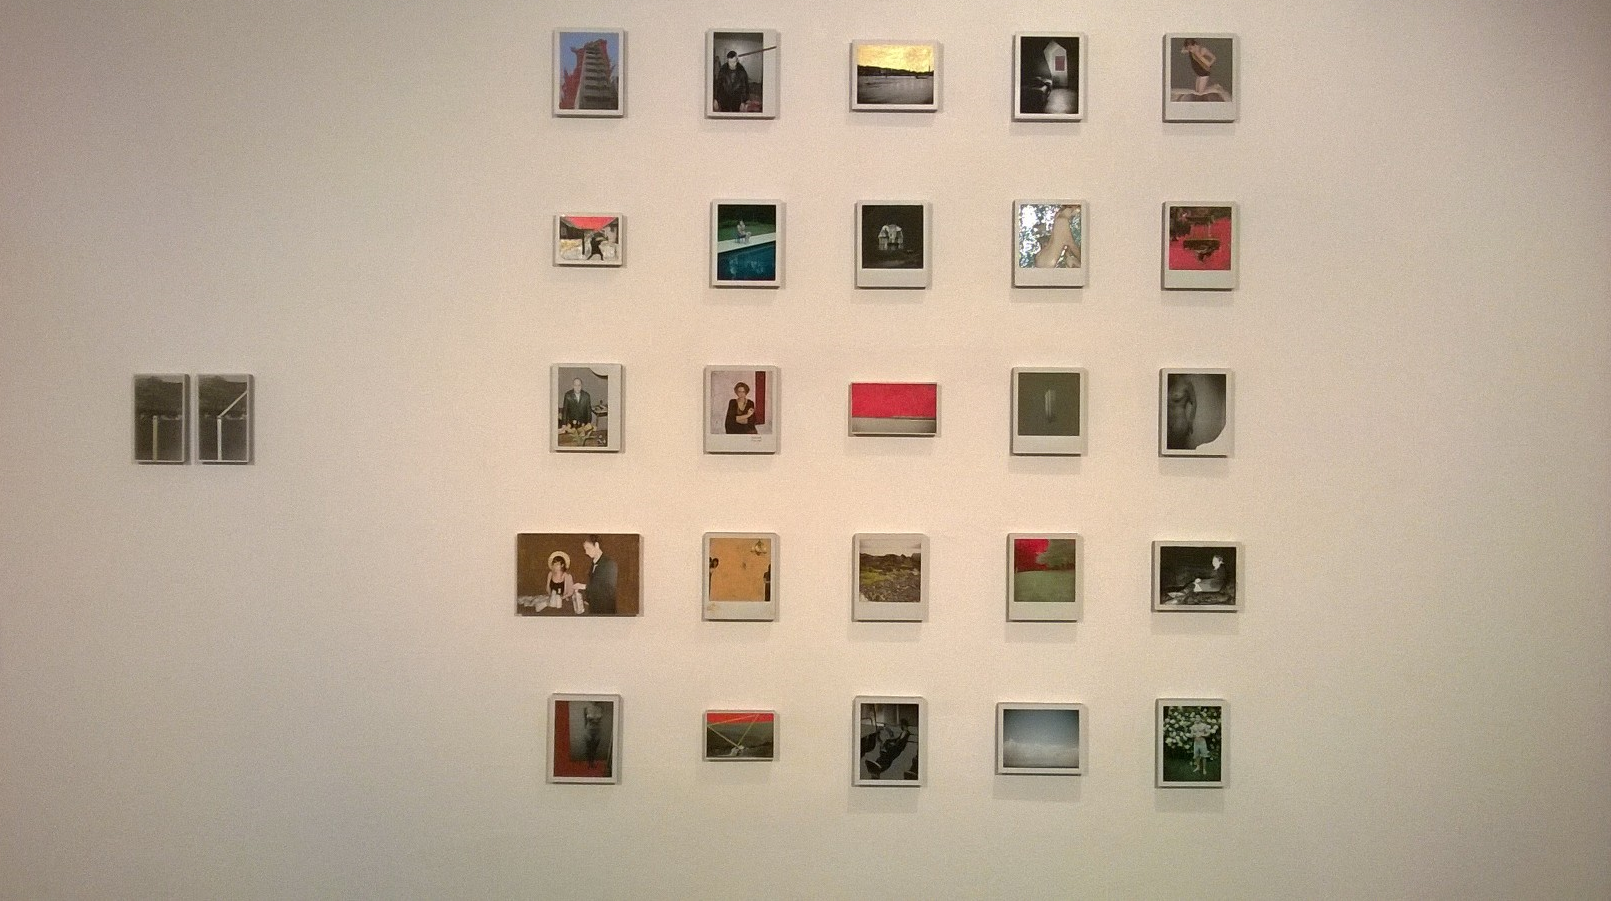 Justin Davis Anderson, 2012-15, Painted polaroid photography installation